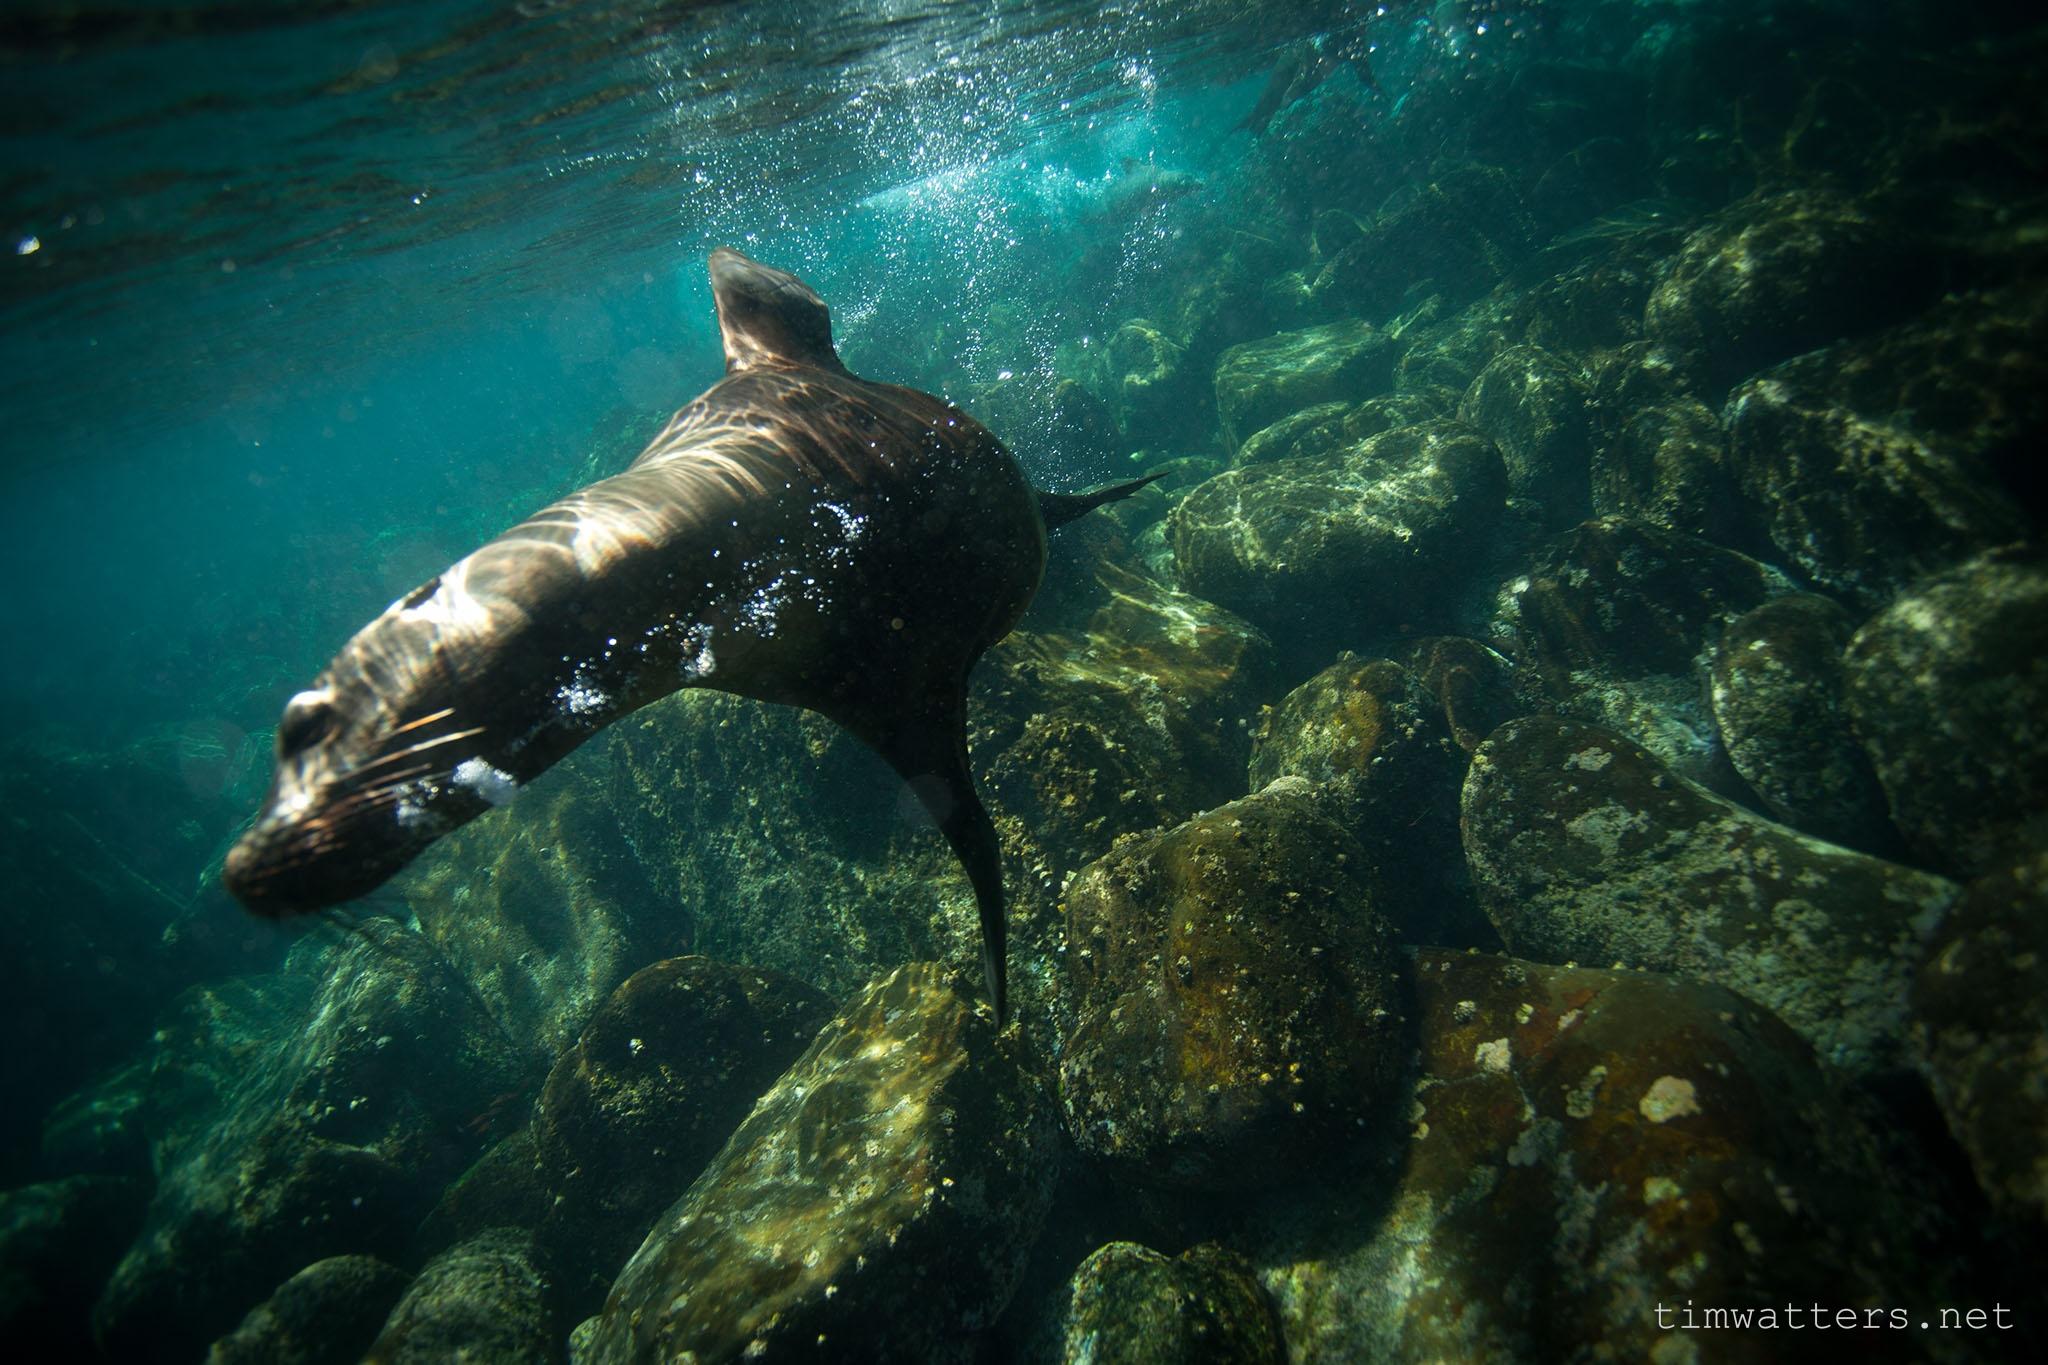 TimWatters_Underwater_15.jpg